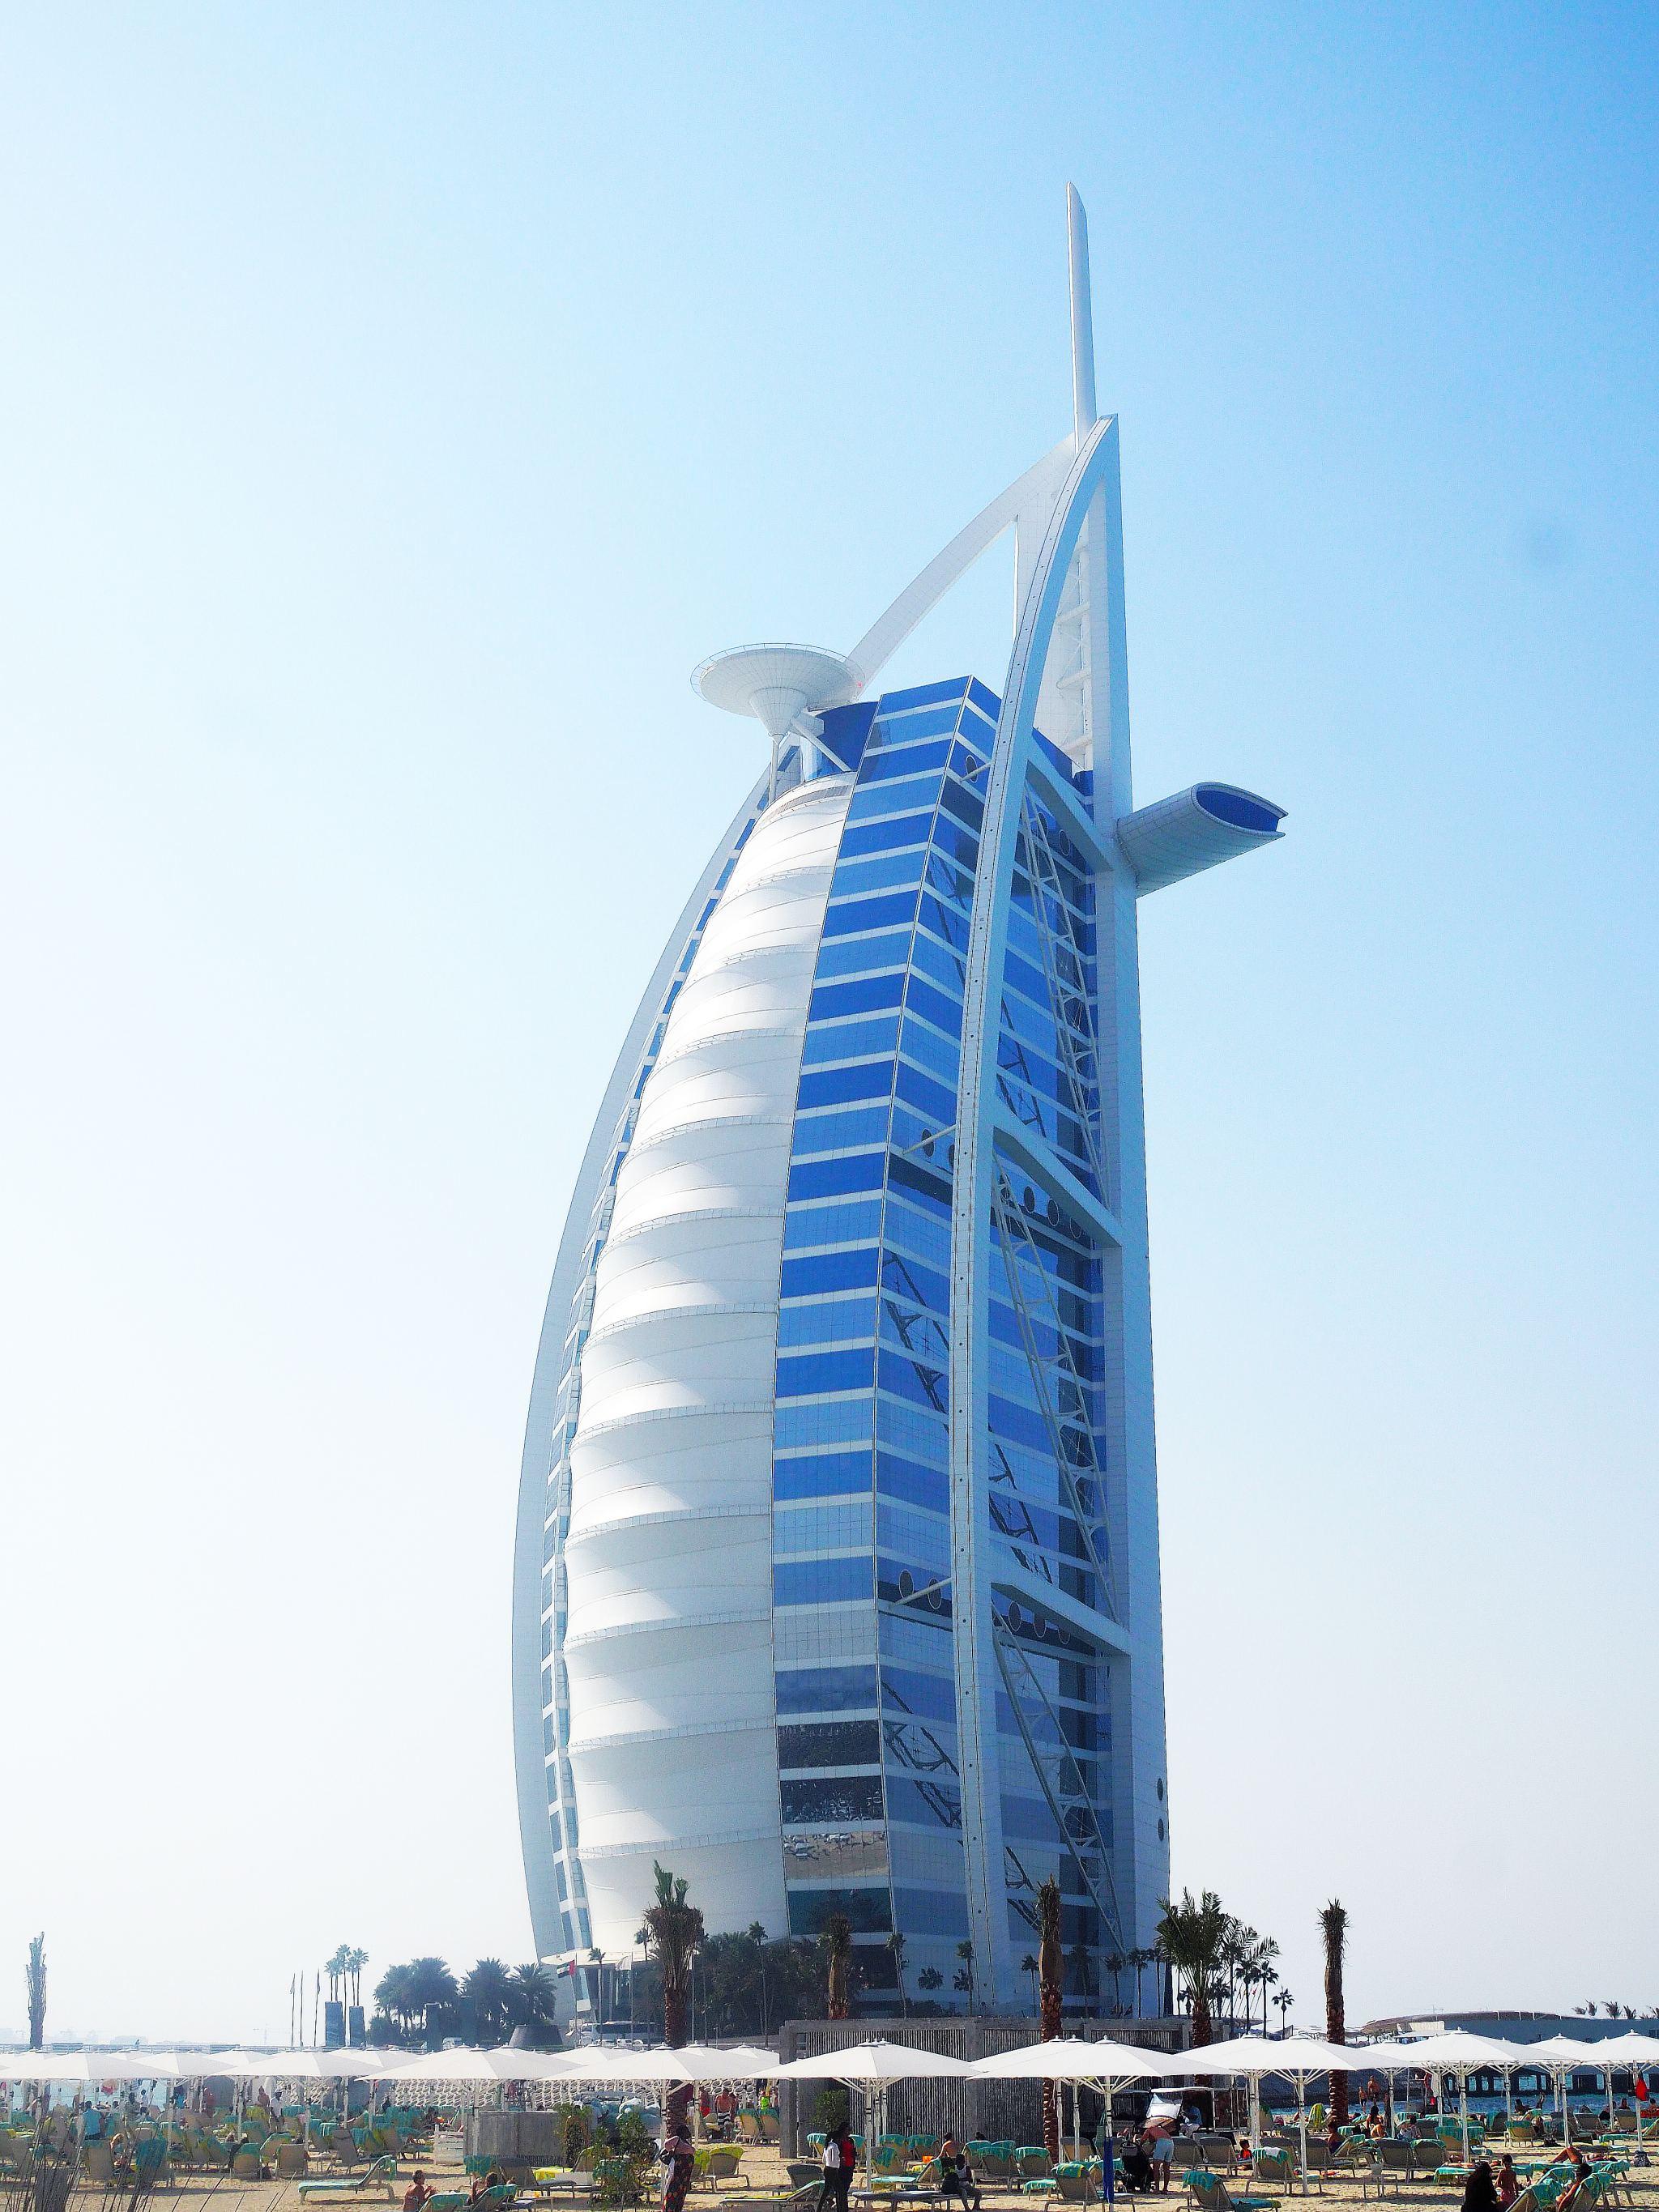 Burj Al Arab - Dubai's 7-star Hotel